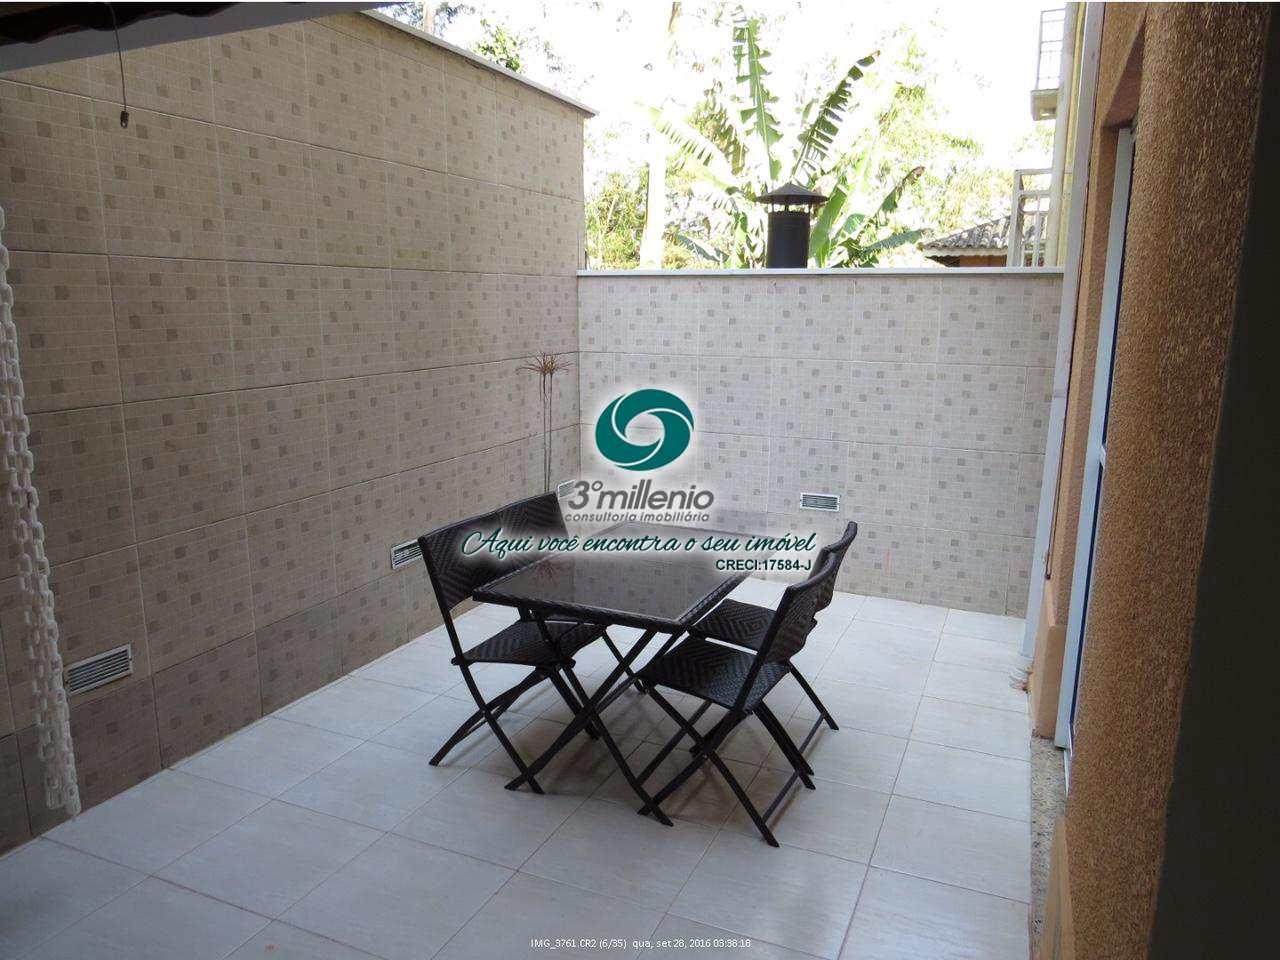 Casa de Condomínio com 3 dorms, Villagio Di Fiori, Cotia - R$ 648.000,00, 139m² - Codigo: 30412